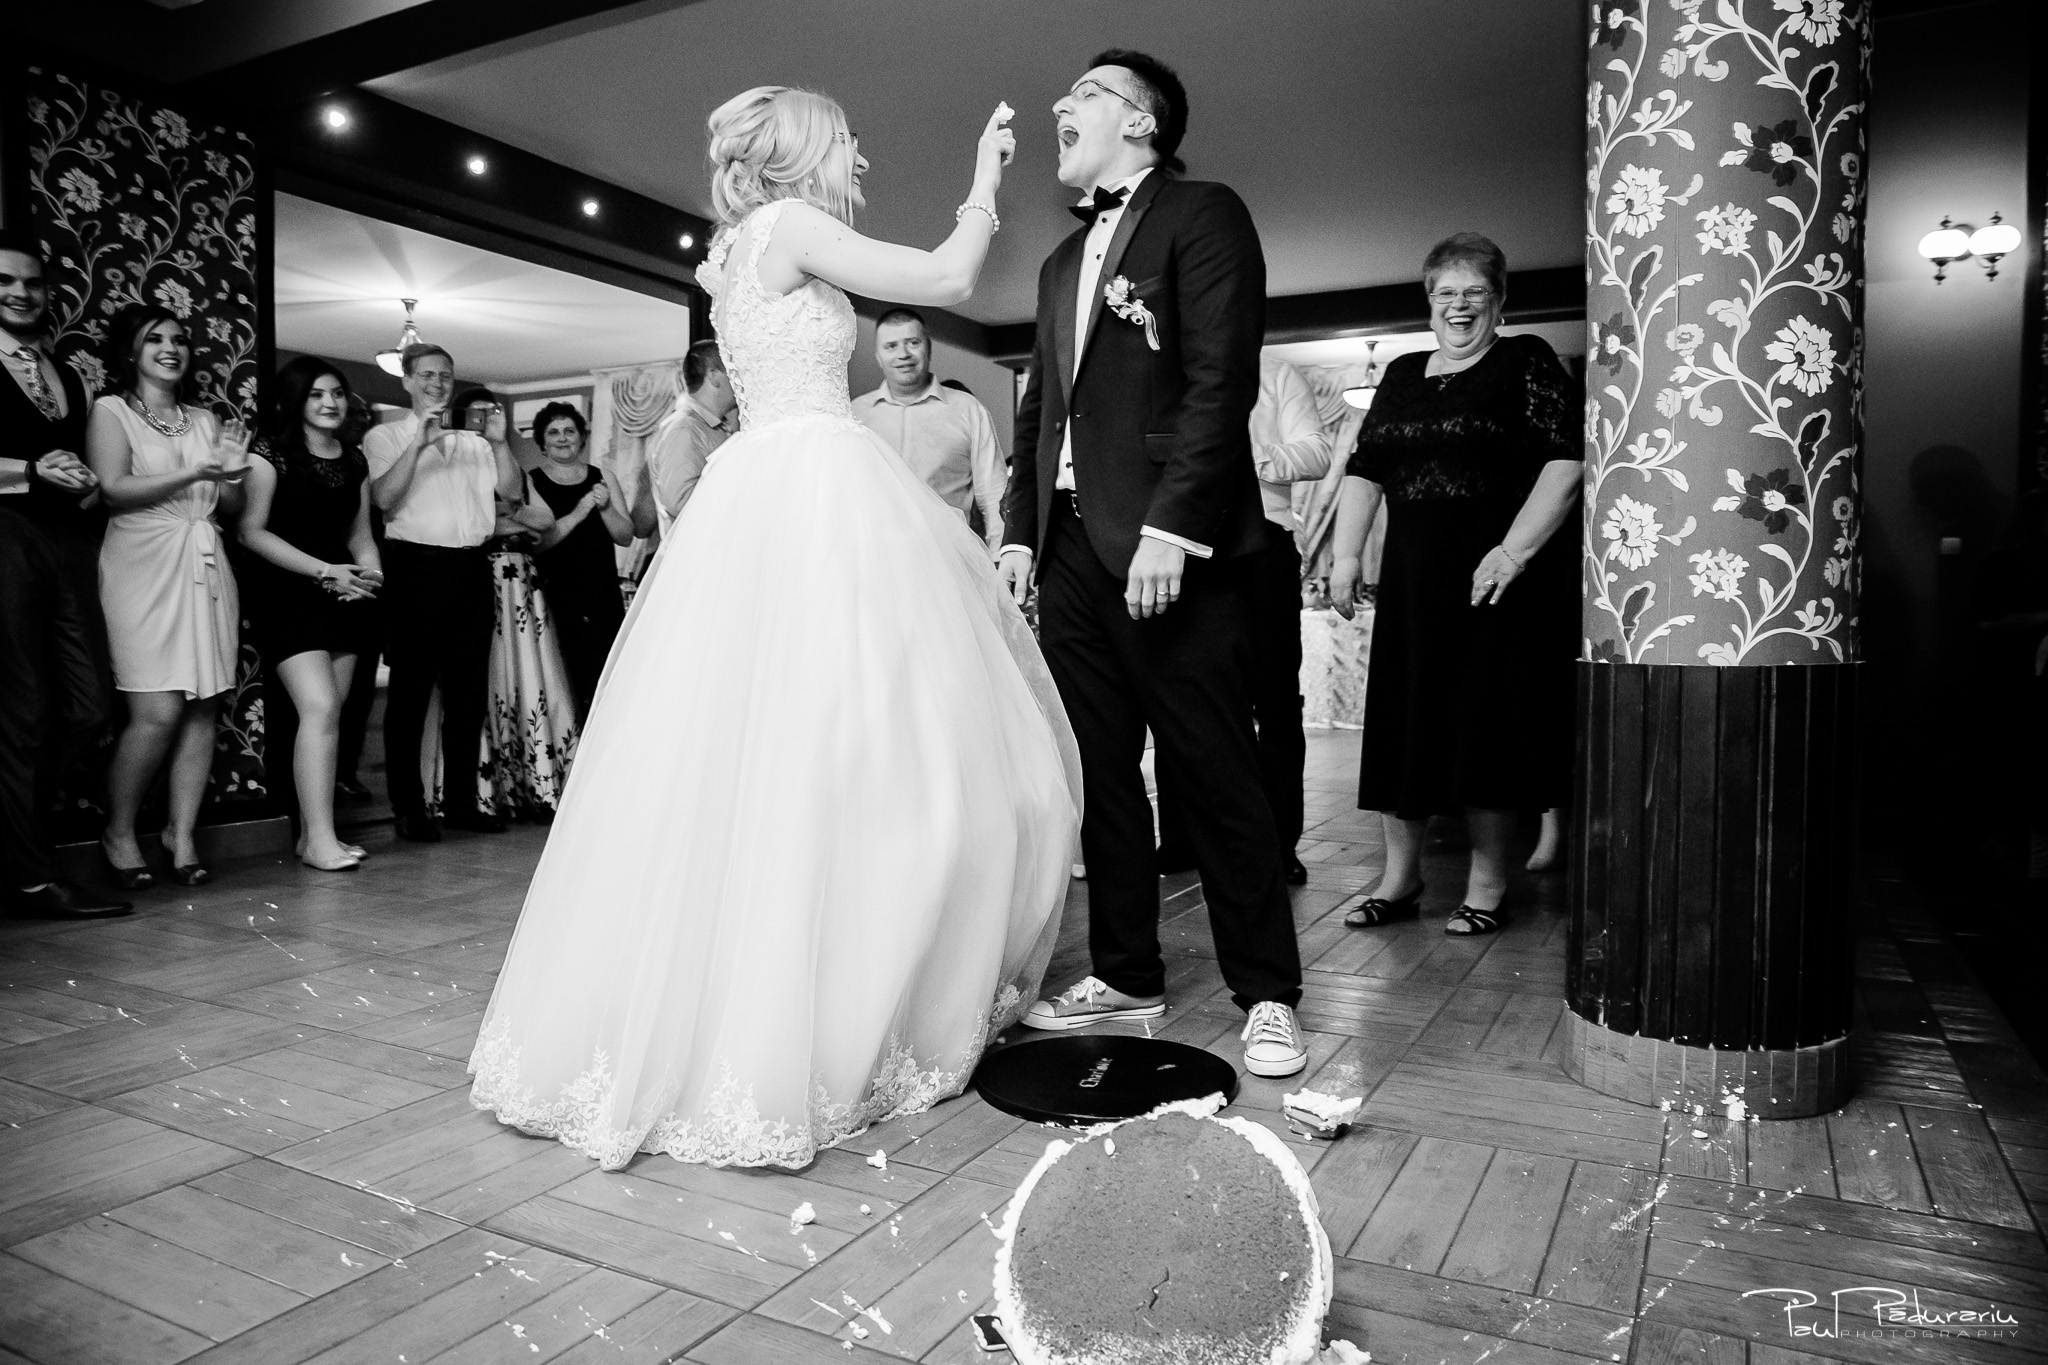 Anca si Razvan petrecere restaurant American Iasi - Paul Padurariu fotograf profesionist nunta iasi www.paulpadurariu.ro © 2018 Paul Padurariu - tort fals 1